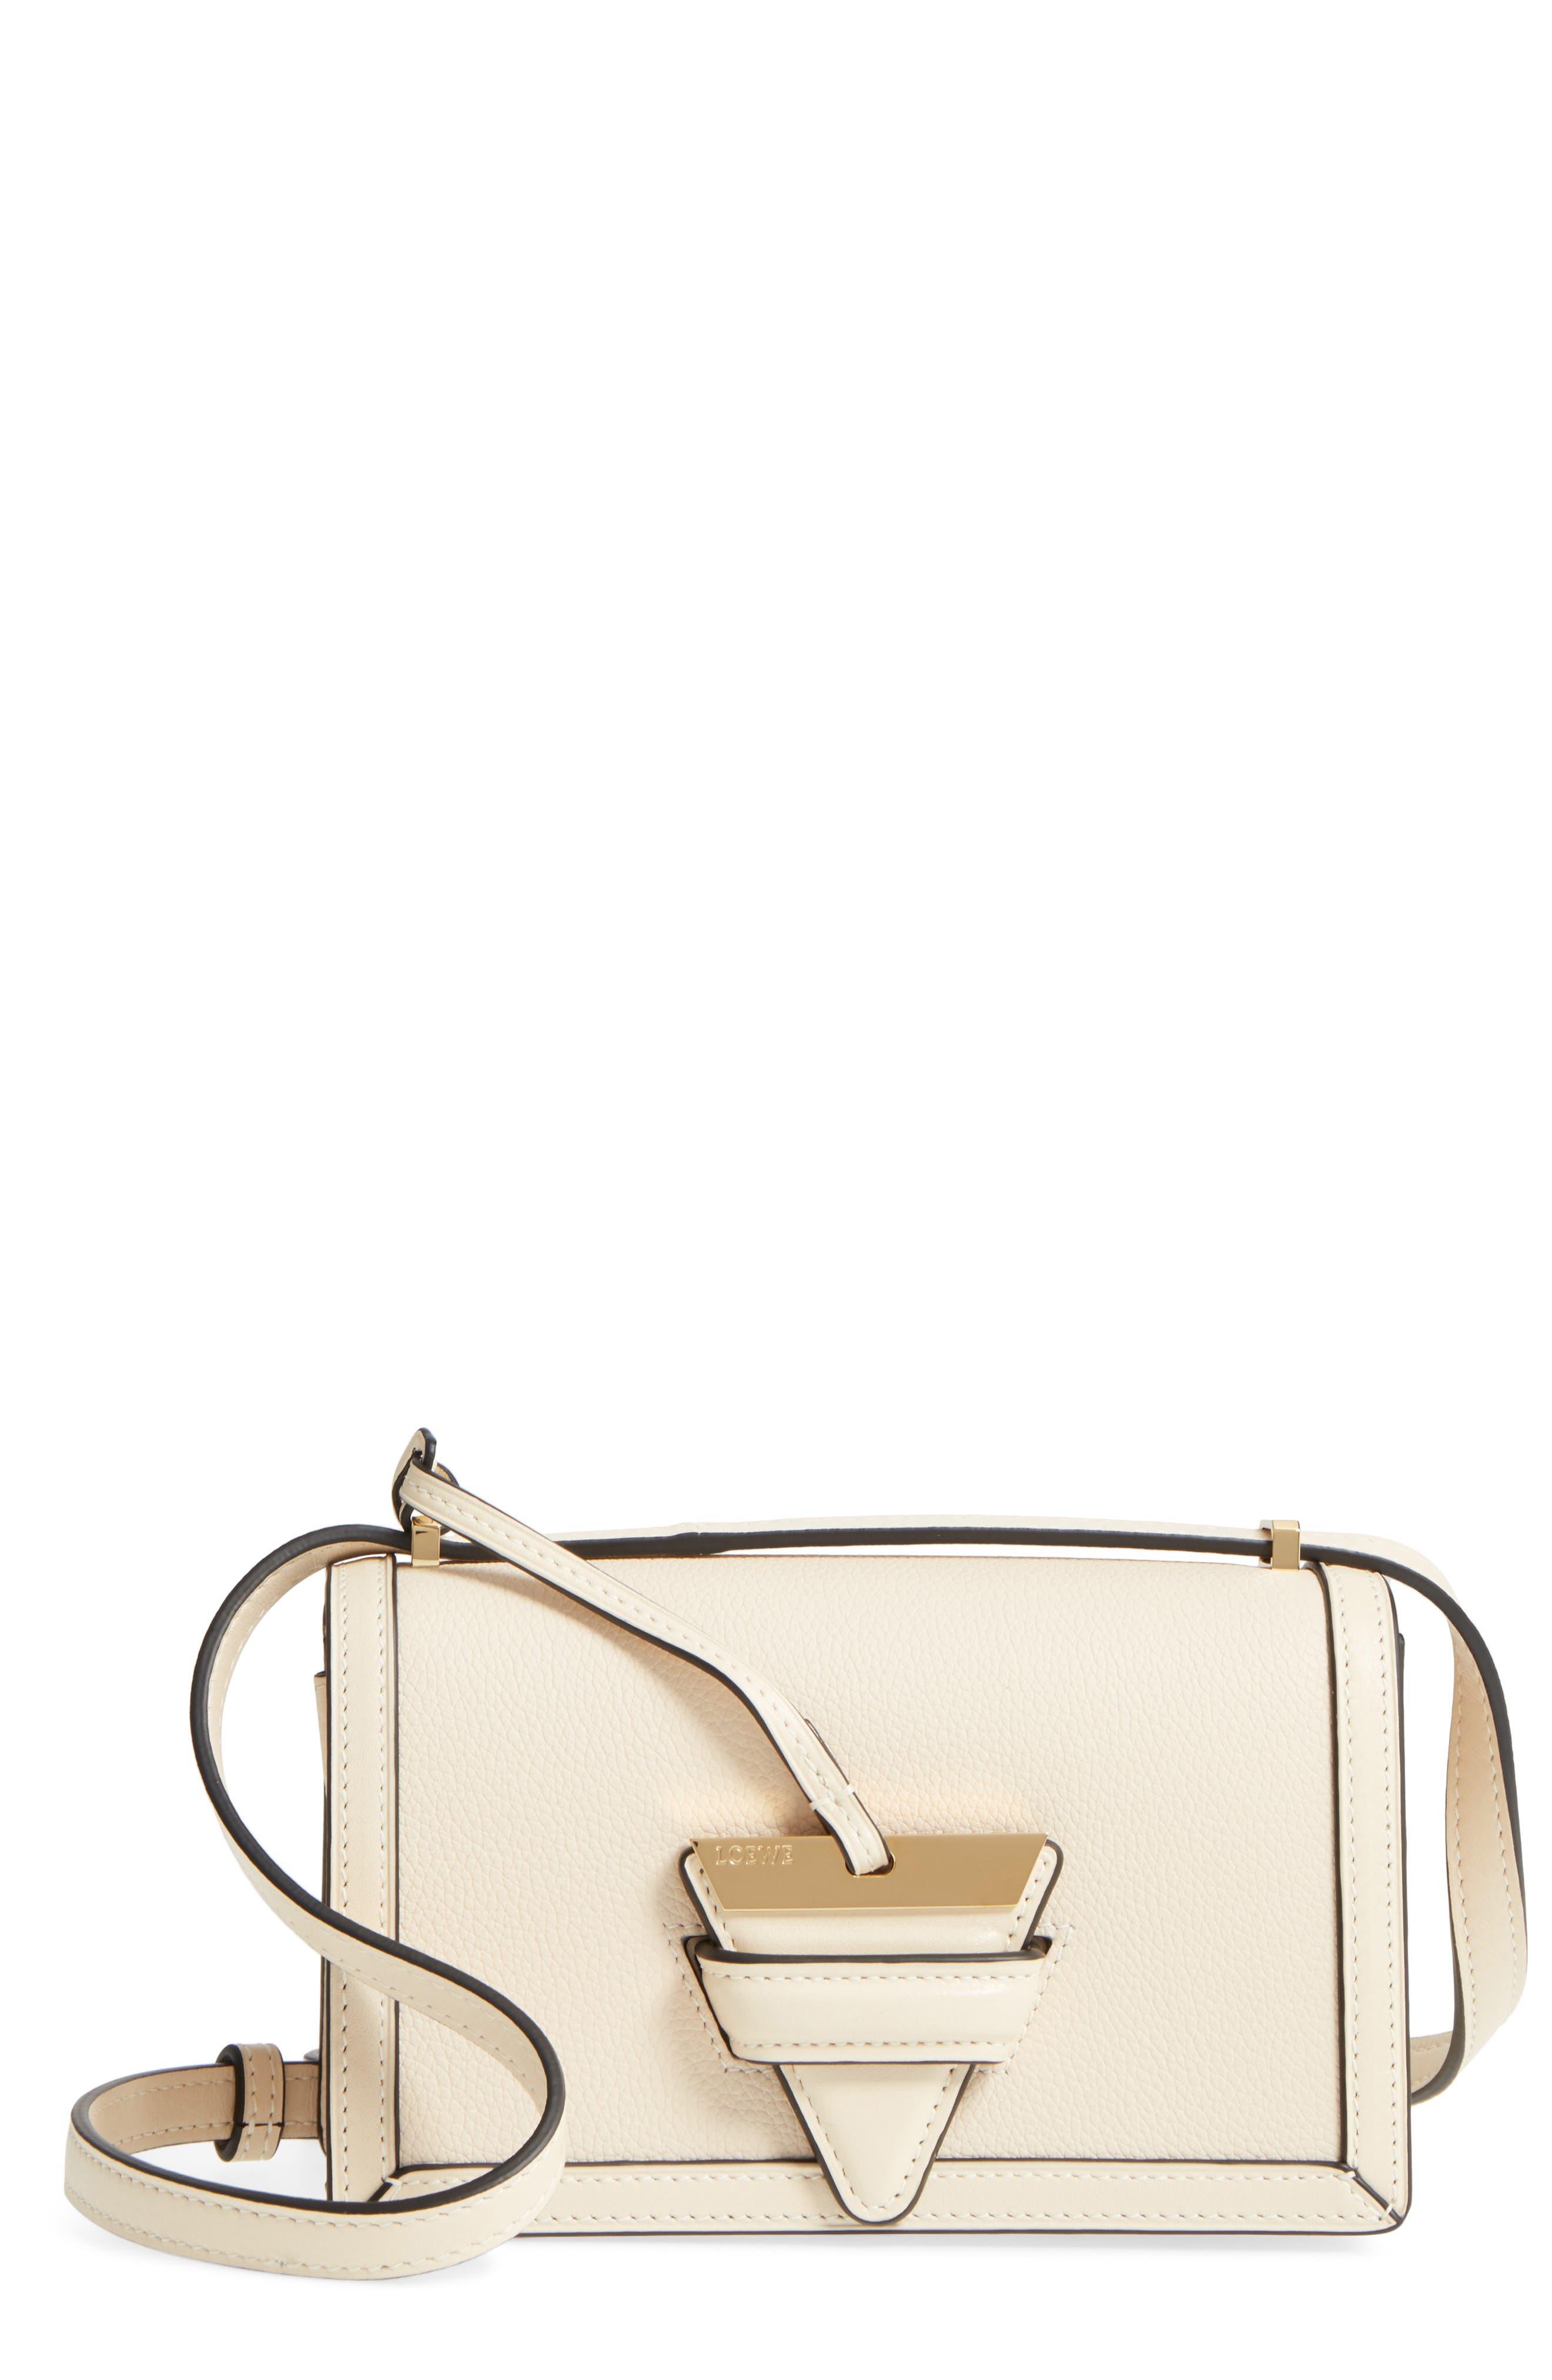 Main Image - Loewe Small Barcelona Grainy Leather Crossbody Bag